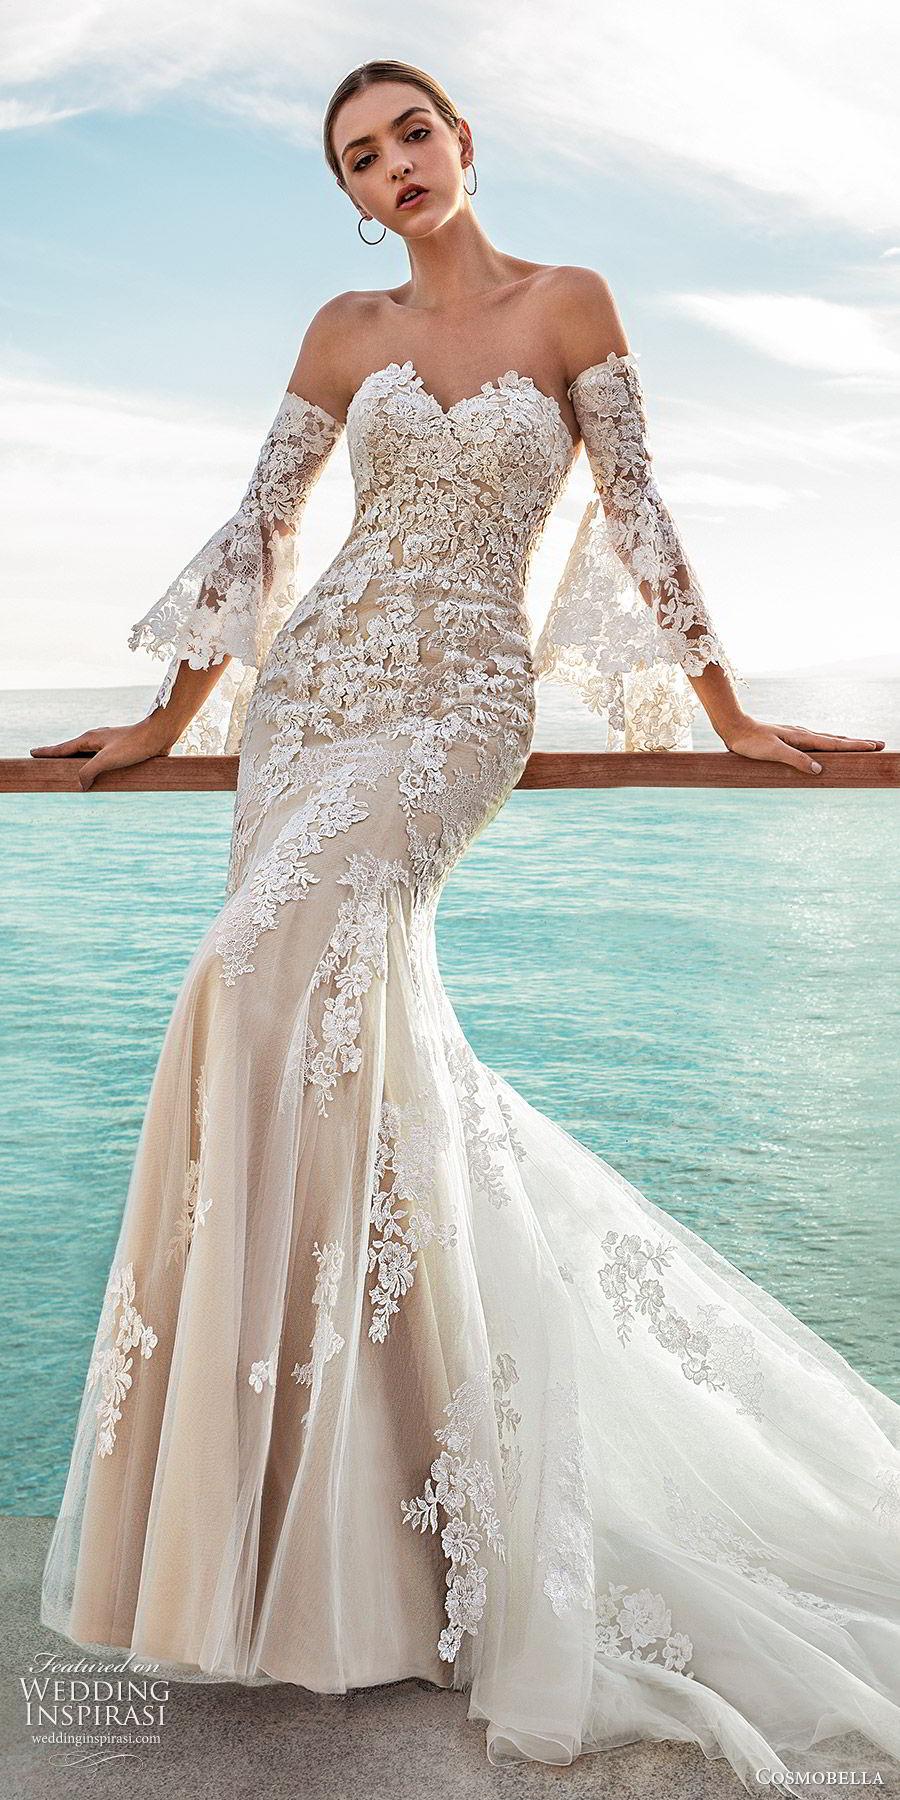 cosmobella 2020 bridal strapless sweetheart detached bell sleeves fully embellished lace tumpet fit flare sheath wedding dress (11) elegant modern chapel train mv